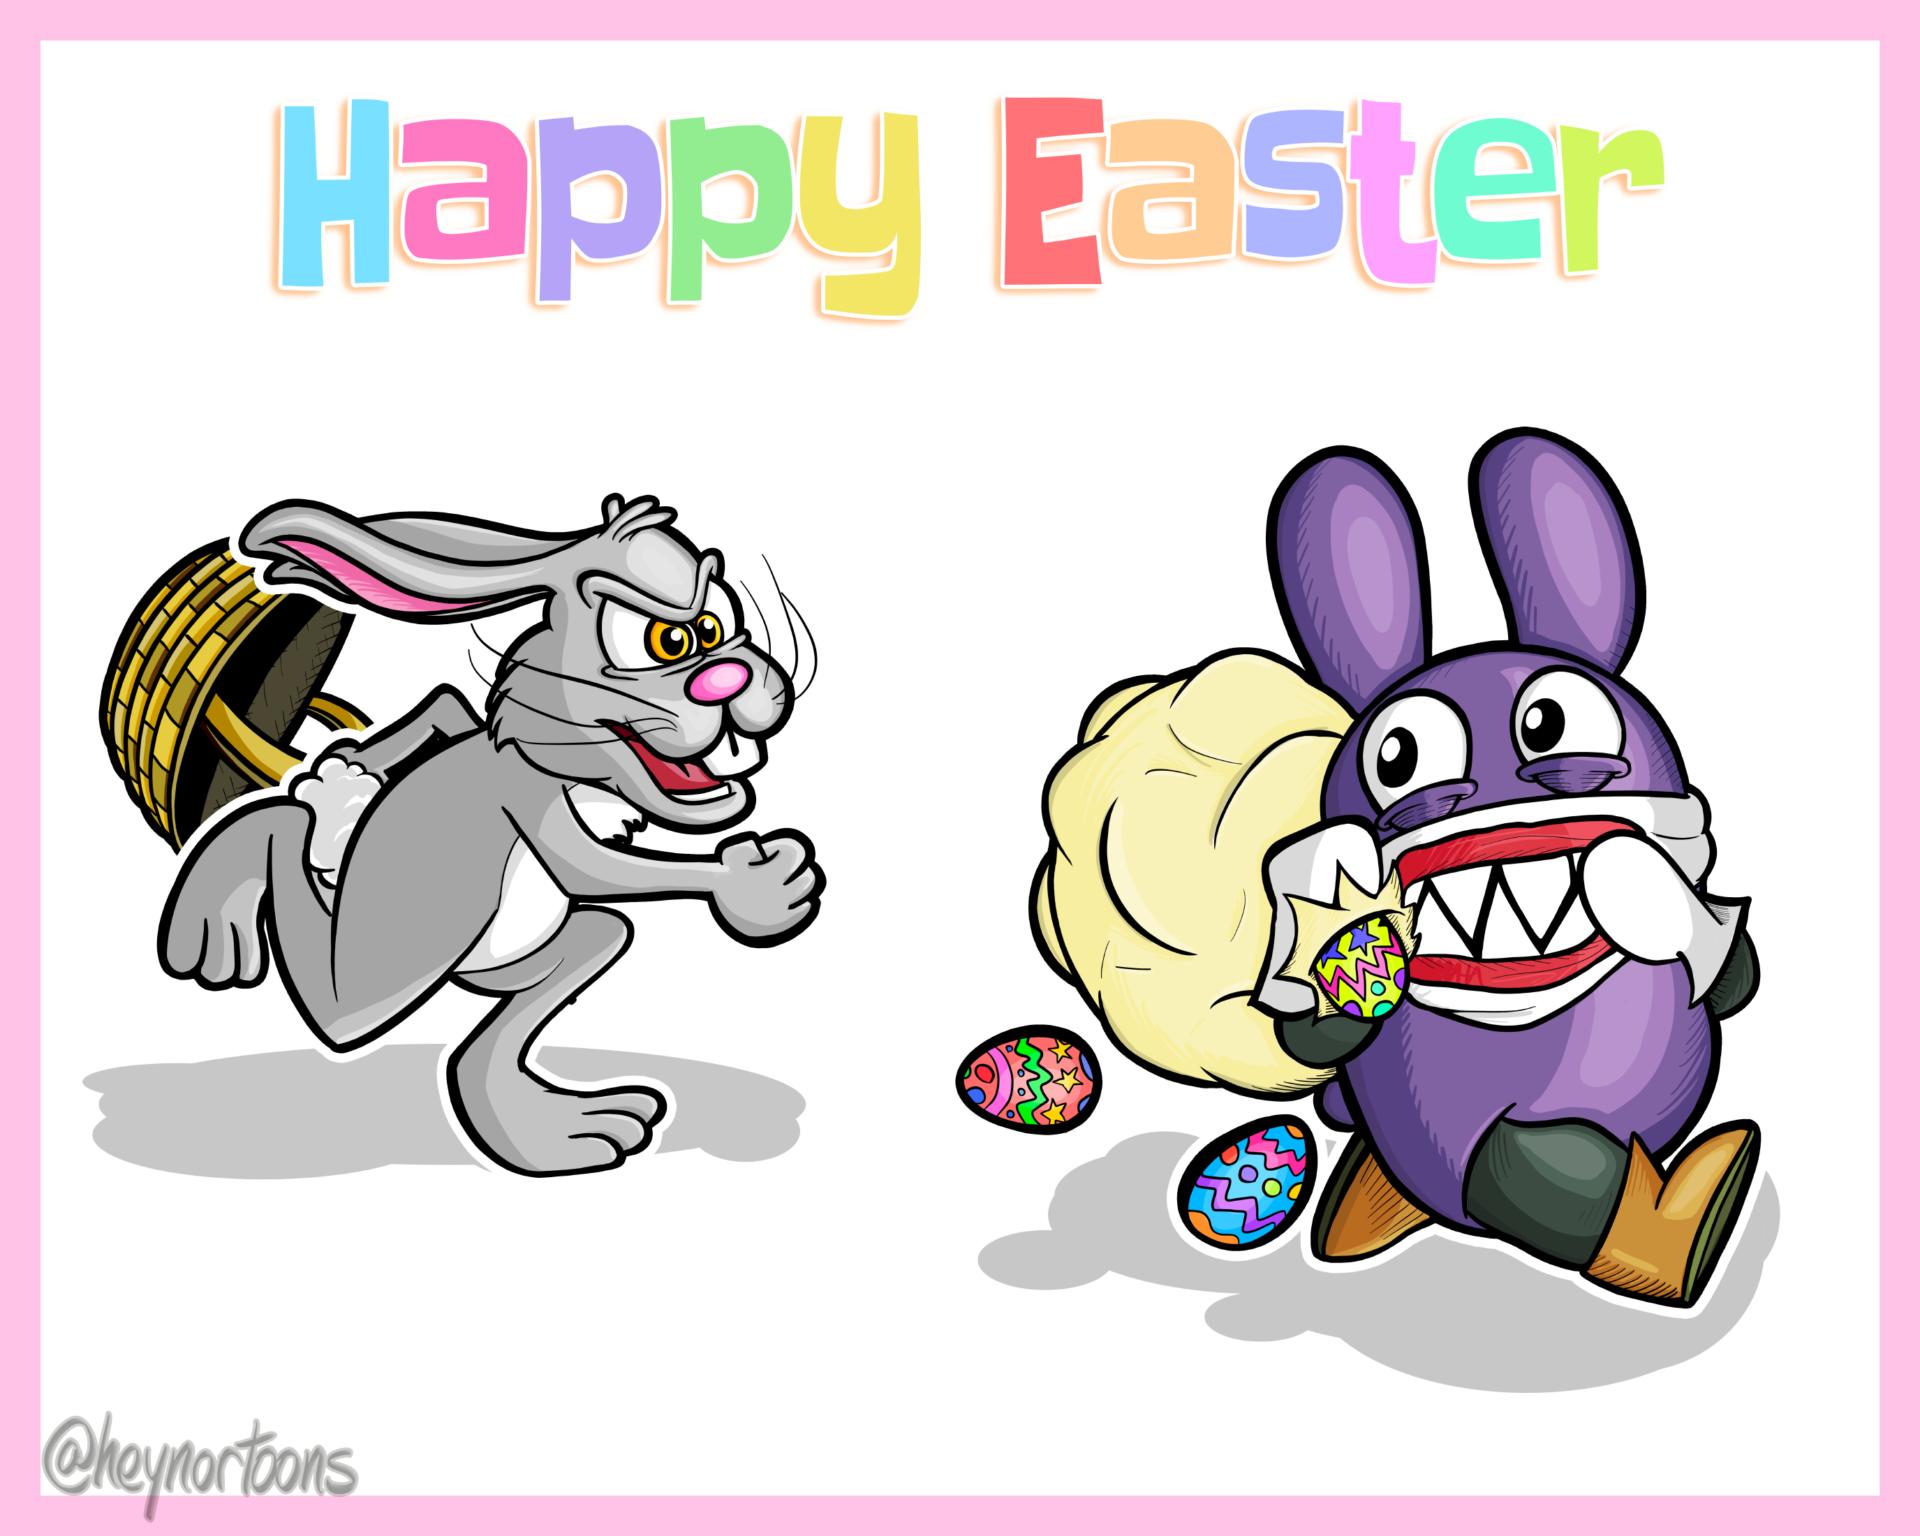 Nabbit: Happy Easter